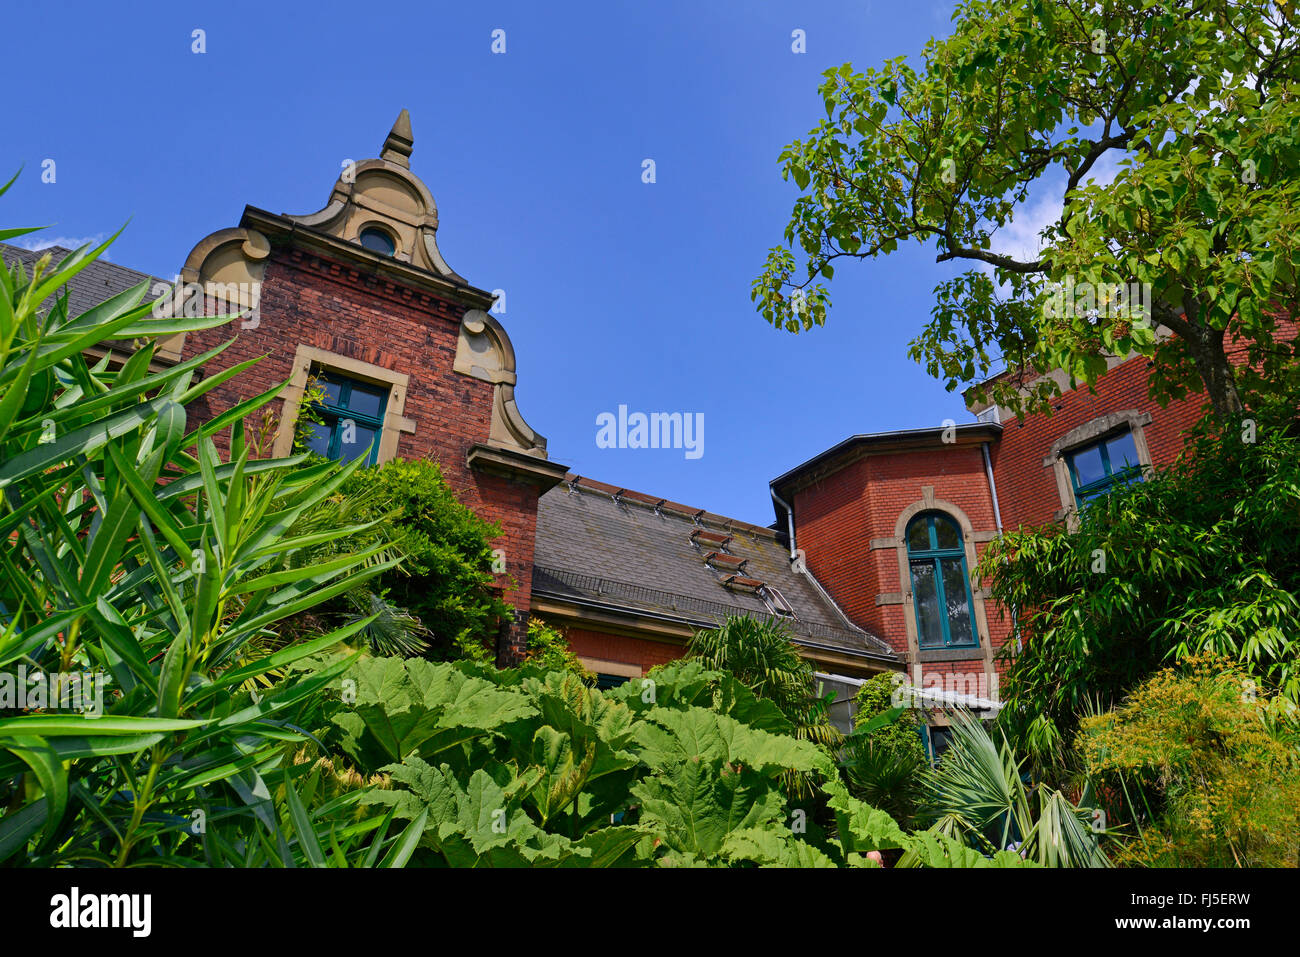 brick building; facade of the Eller�sche Villa at the Botanical Gardens Wuppertal, Germany, North Rhine-Westphalia, - Stock Image